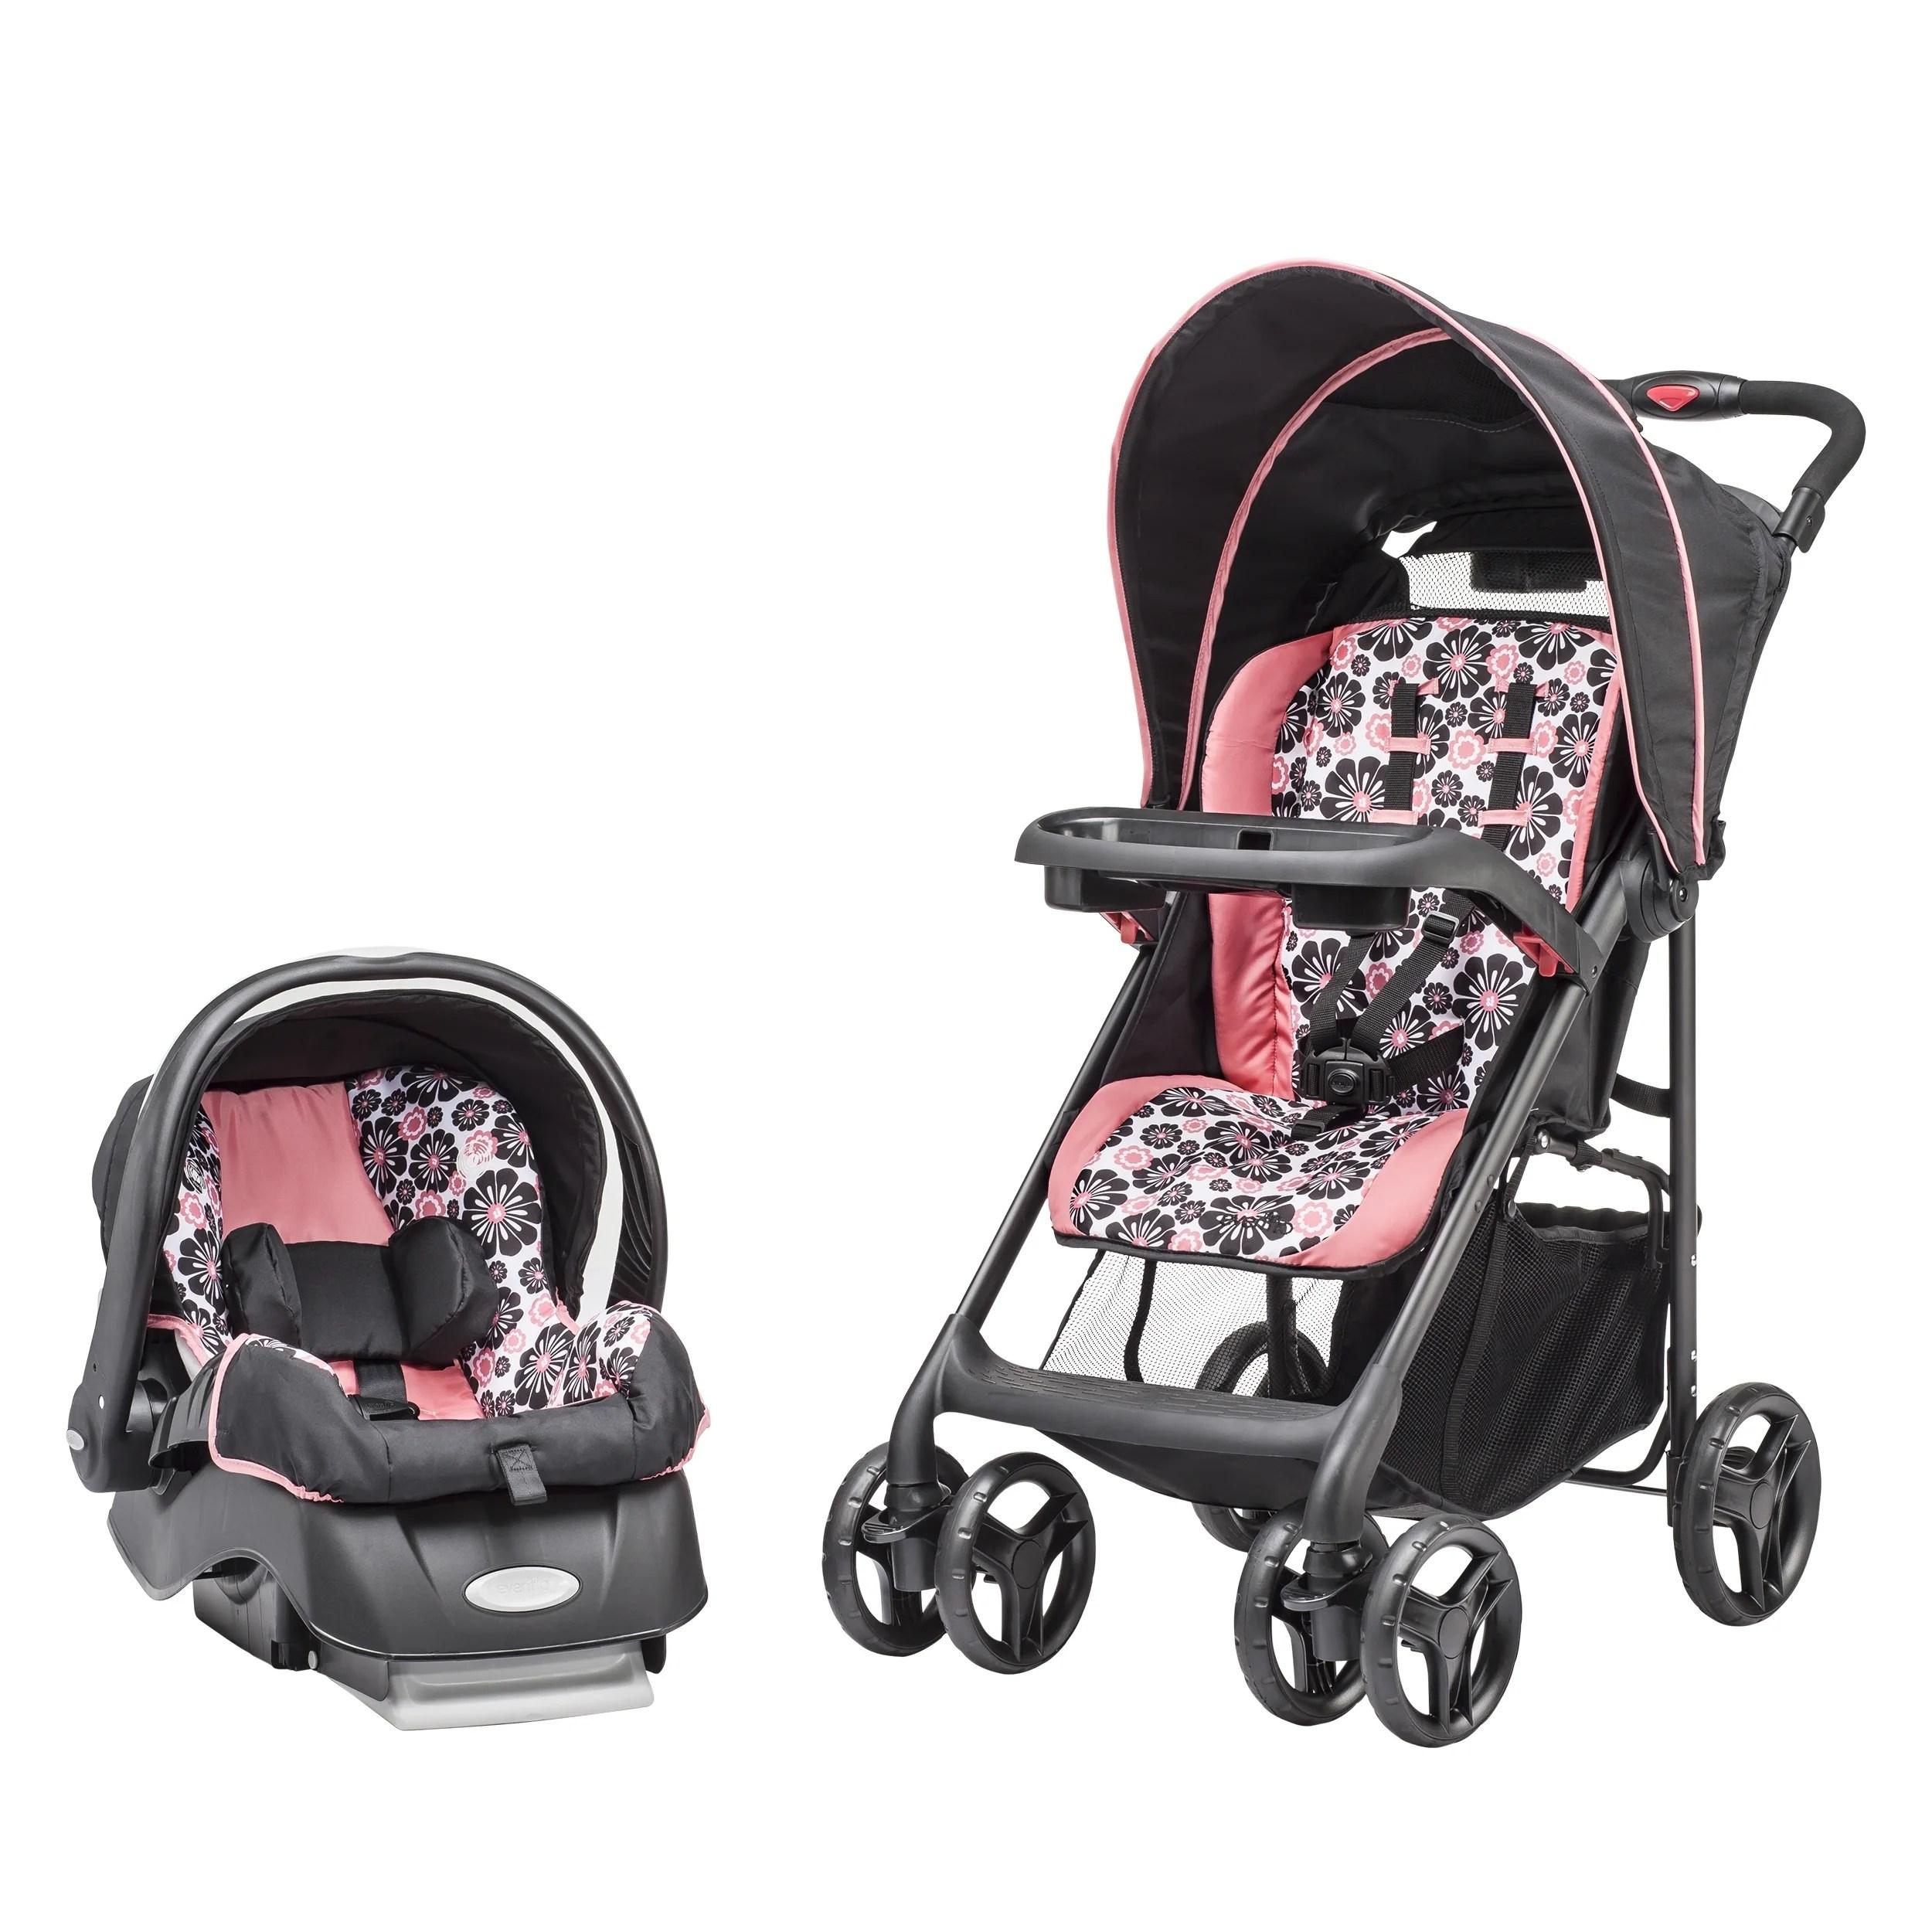 Evenflo Baby Travel System